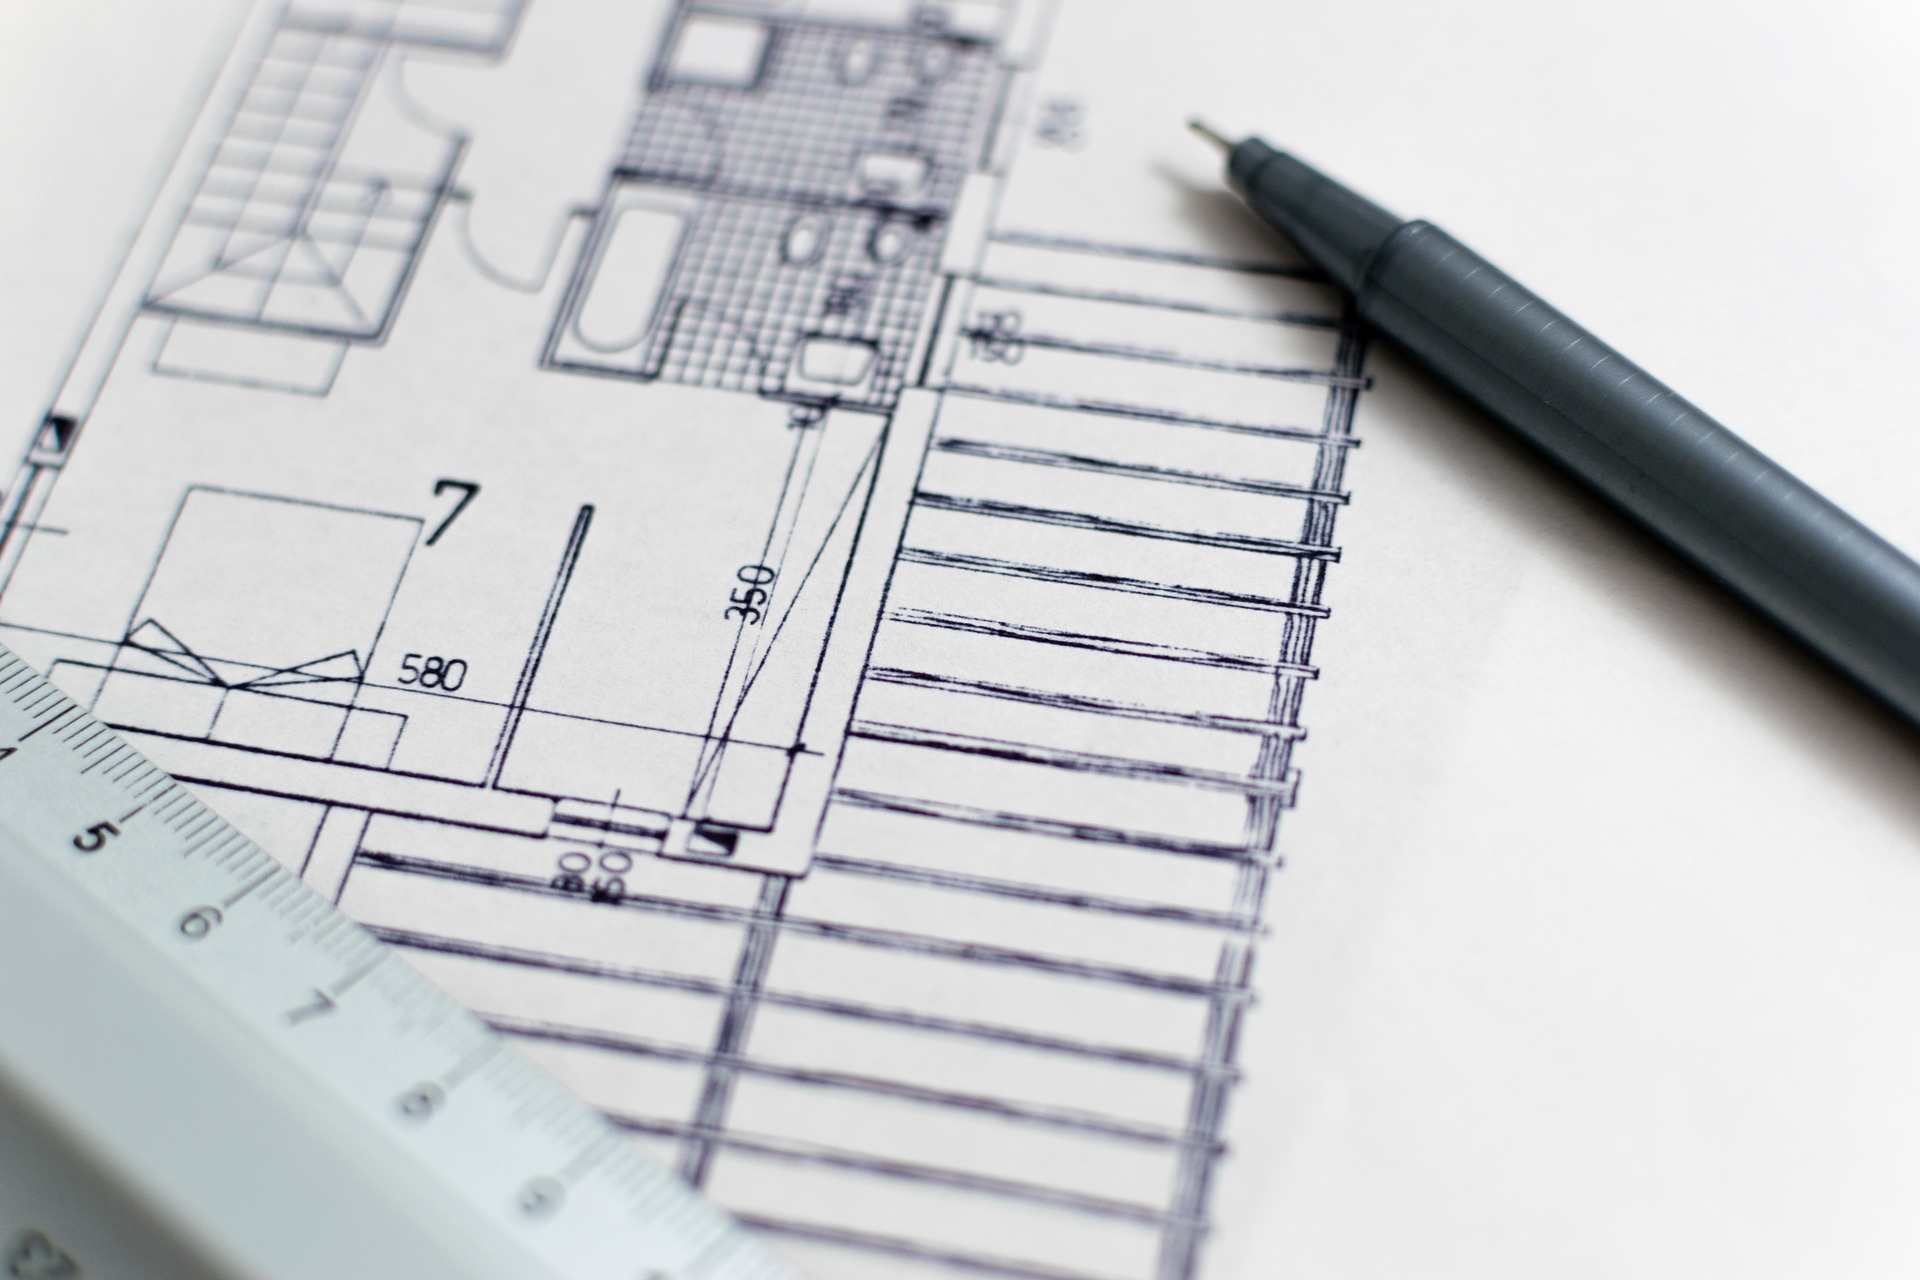 architecture plans dessin picture